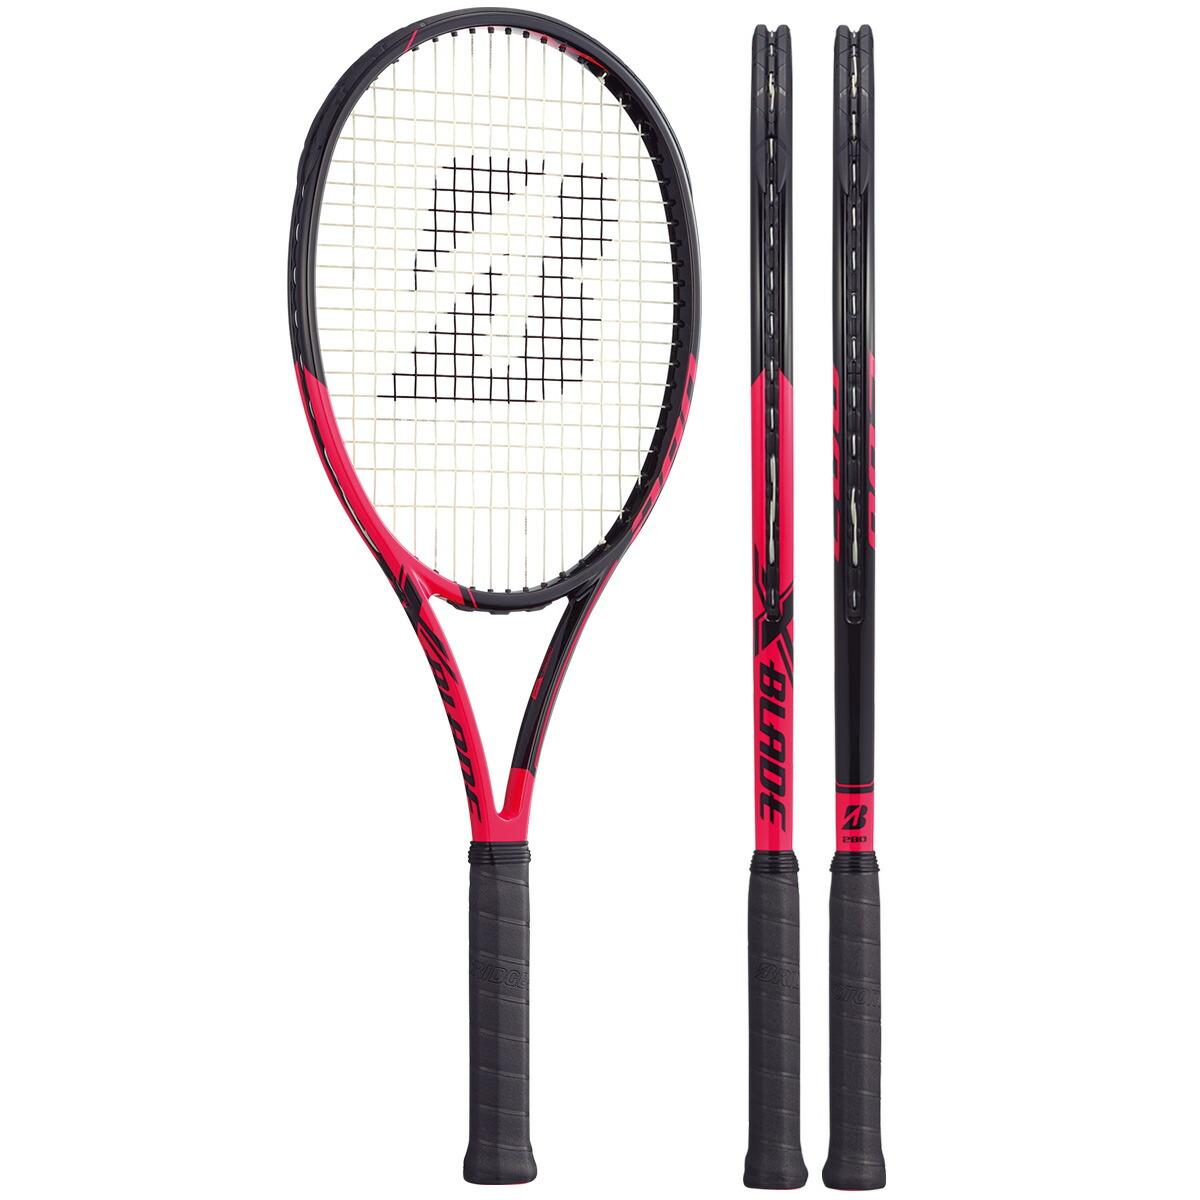 【WEB限定】 ブリヂストン BRABX4 BRIDGESTONE 硬式テニスラケット X-BLADE BX 280 BRIDGESTONE エックスブレード 280 ビーエックス 280 BRABX4【Tシャツまたはサコッシュプレゼント】, 家具通販kagu-world:f3fdafb3 --- konecti.dominiotemporario.com